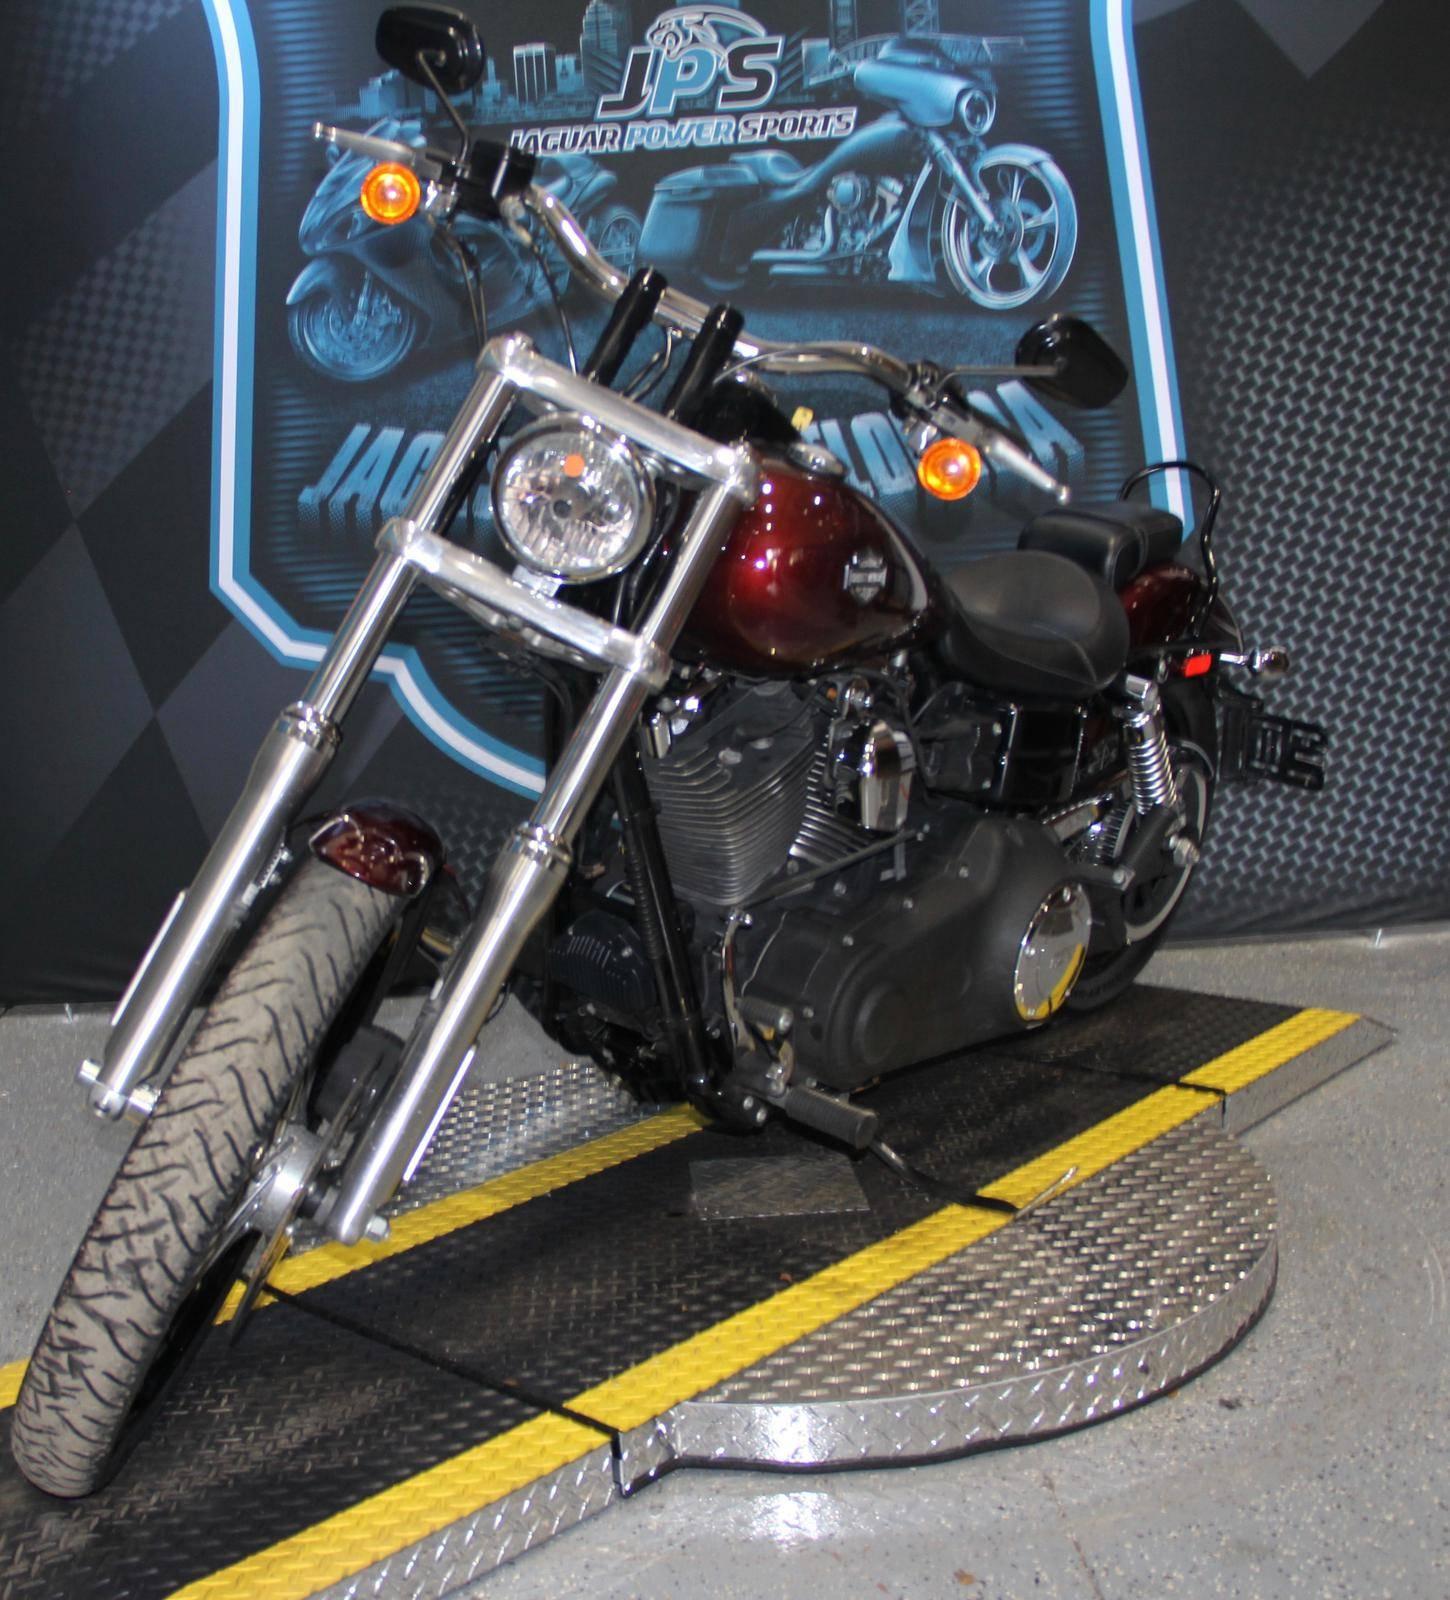 Used 2015 Harley-Davidson FXDWG 103 Motorcycles in Jacksonville, FL